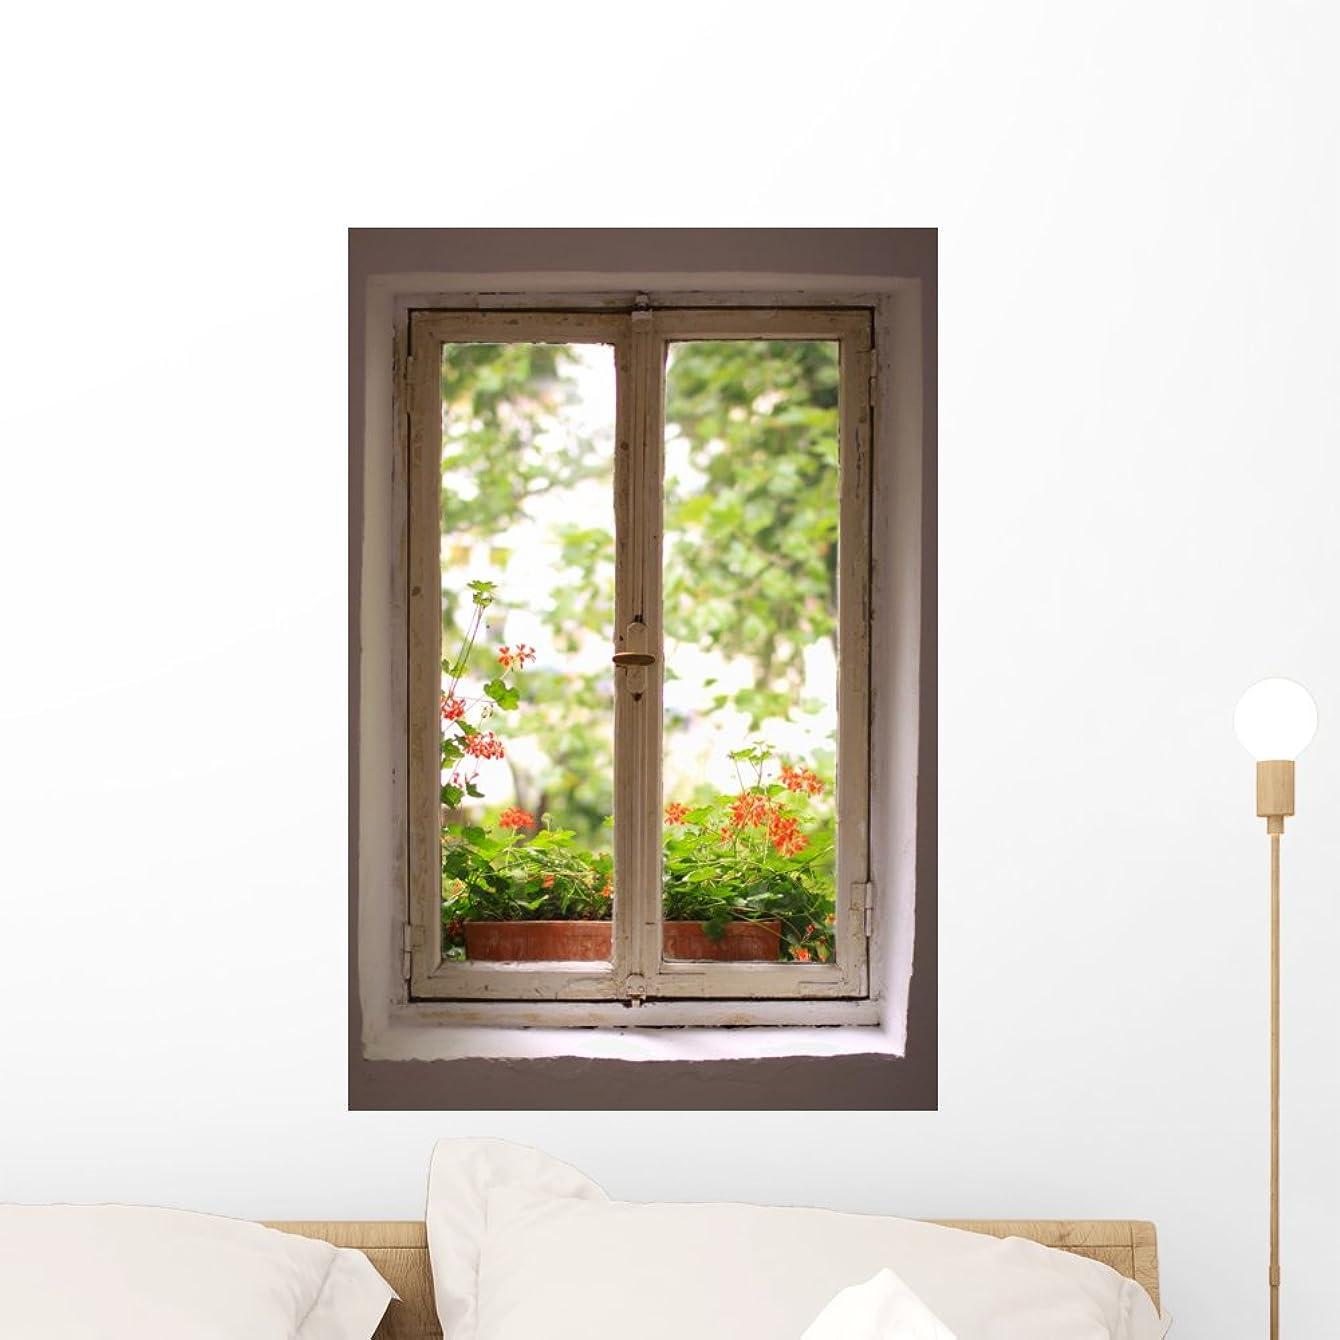 Wallmonkeys WM199818 Window to The Garden Peel and Stick Wall Decals (24 in H x 16 in W), Medium